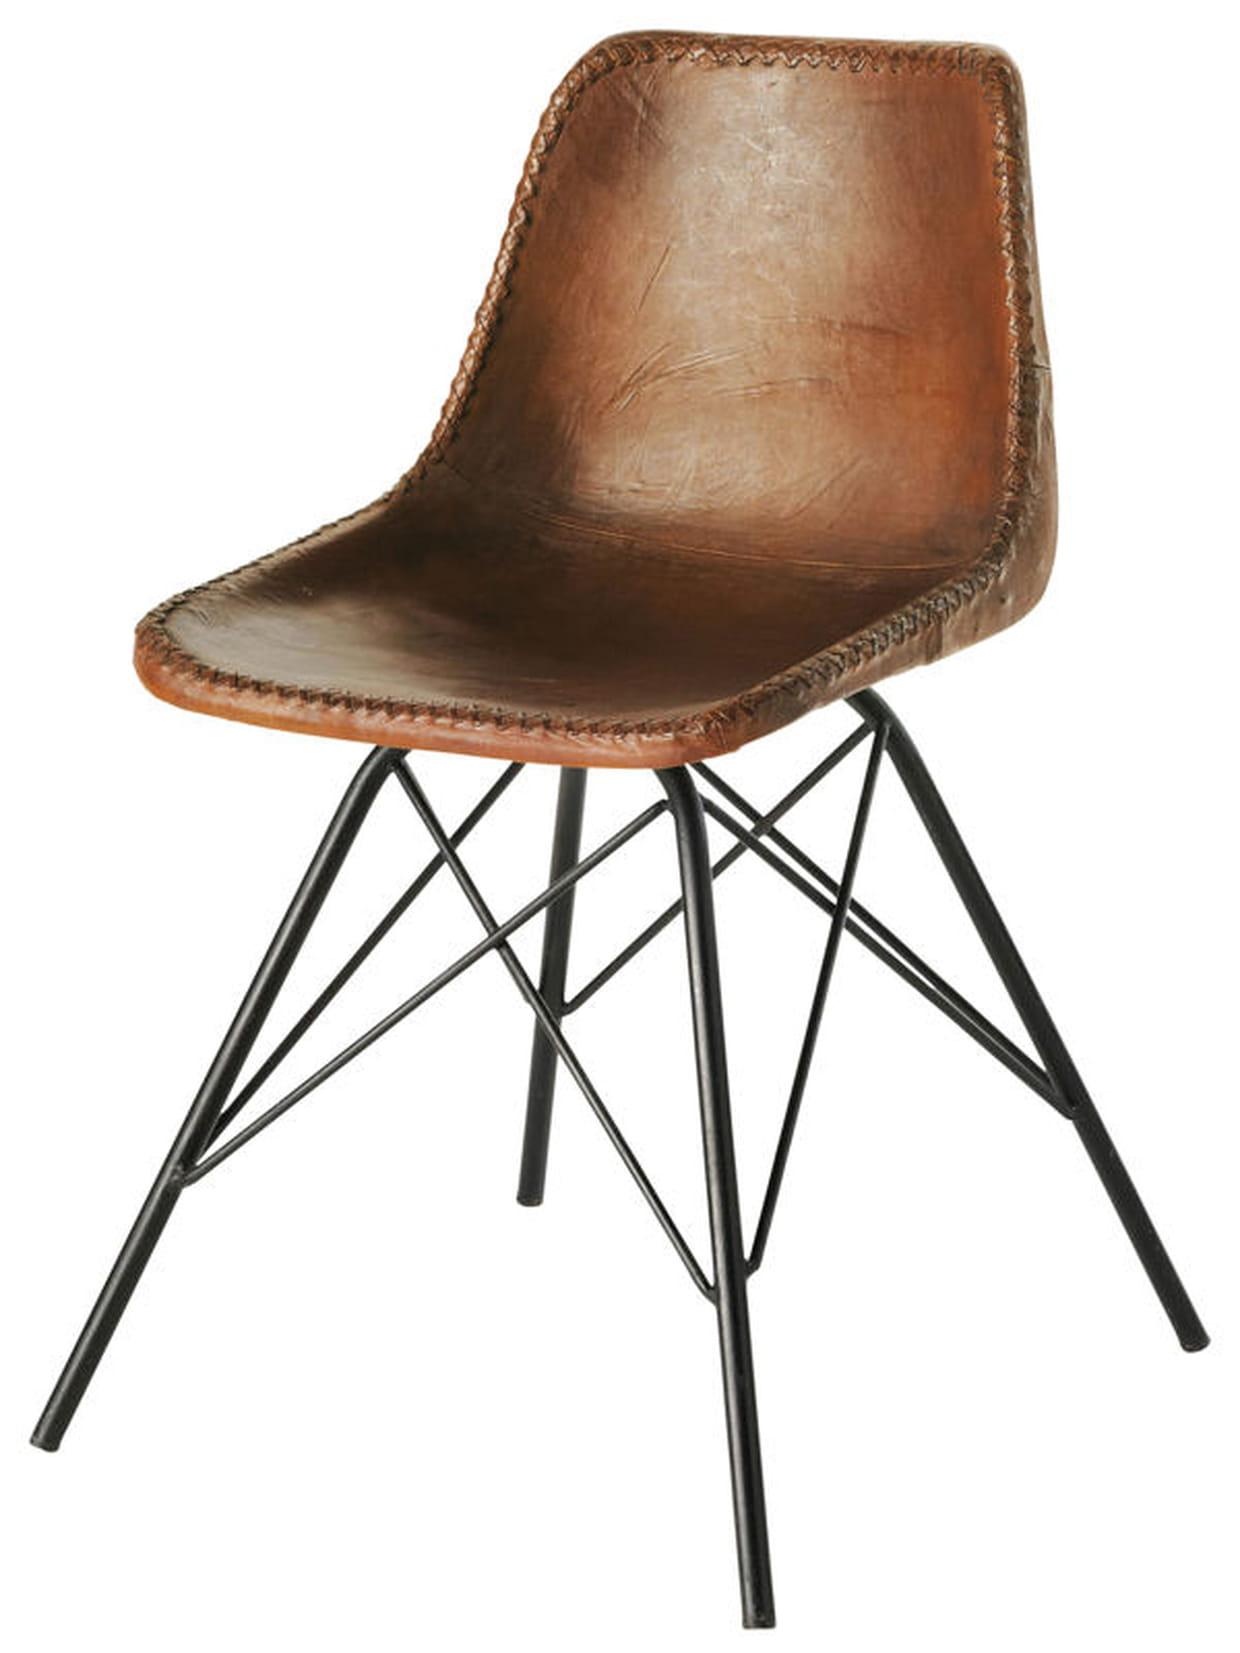 chaise vintage en cuir marron. Black Bedroom Furniture Sets. Home Design Ideas